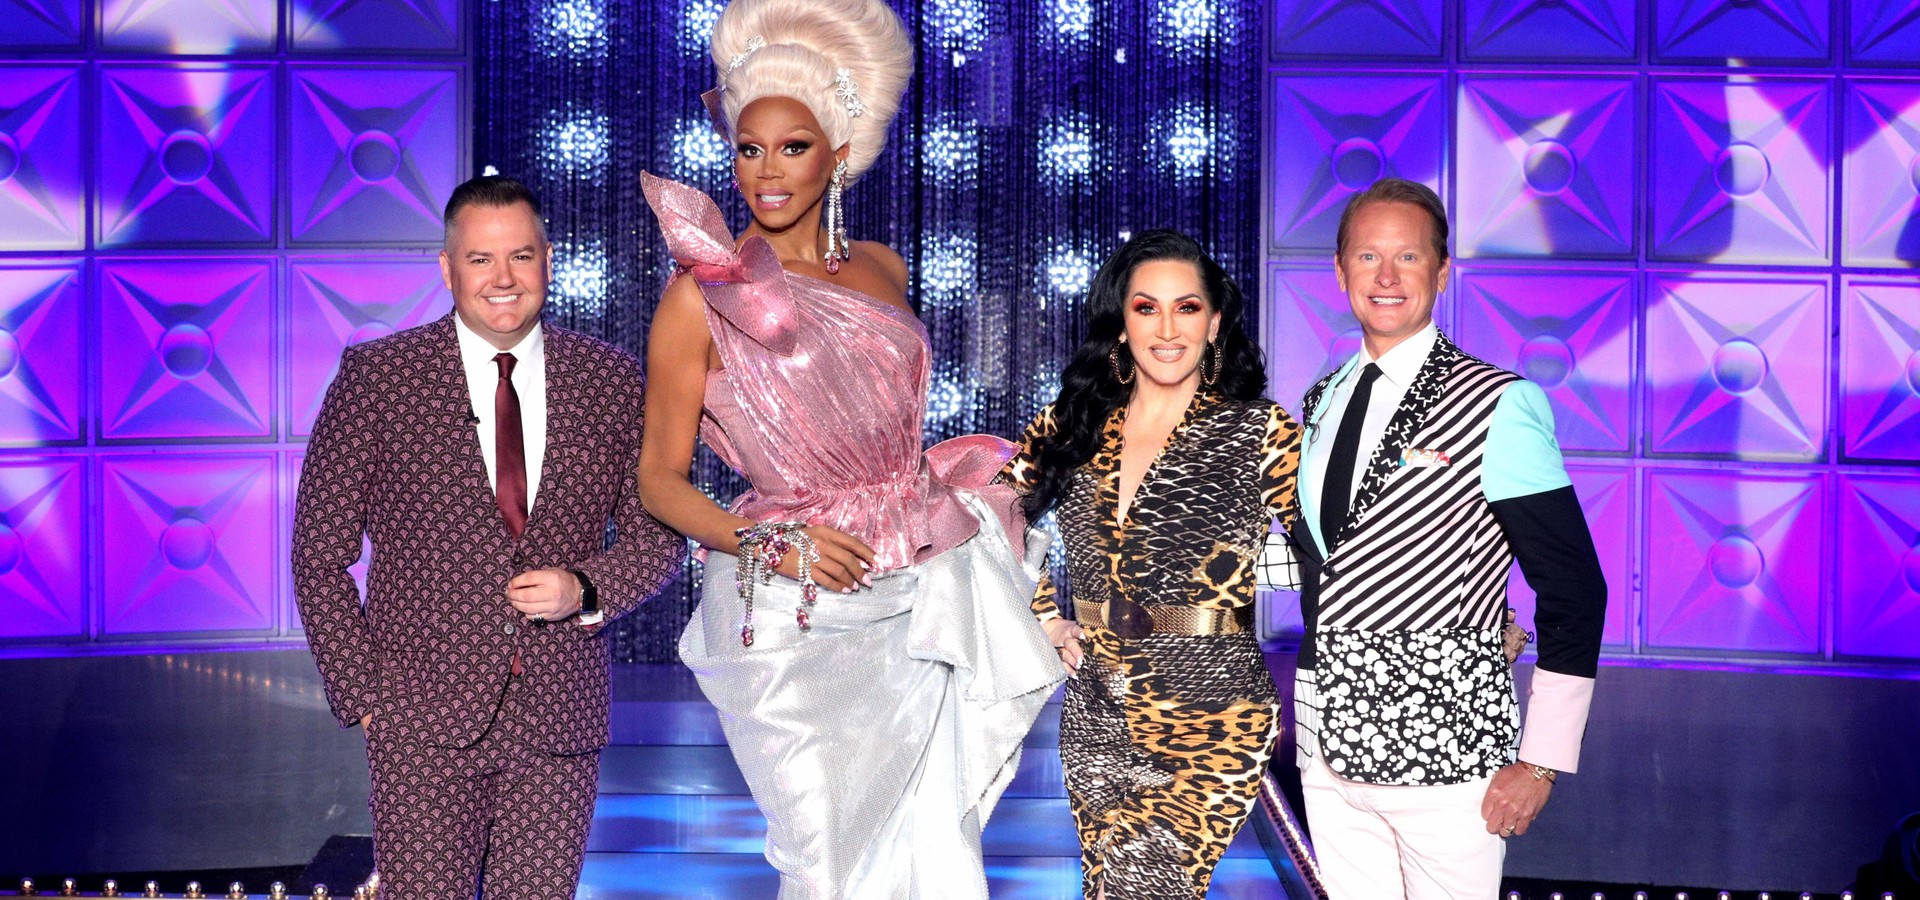 RuPaul: Reinas del drag: Especial famoseo